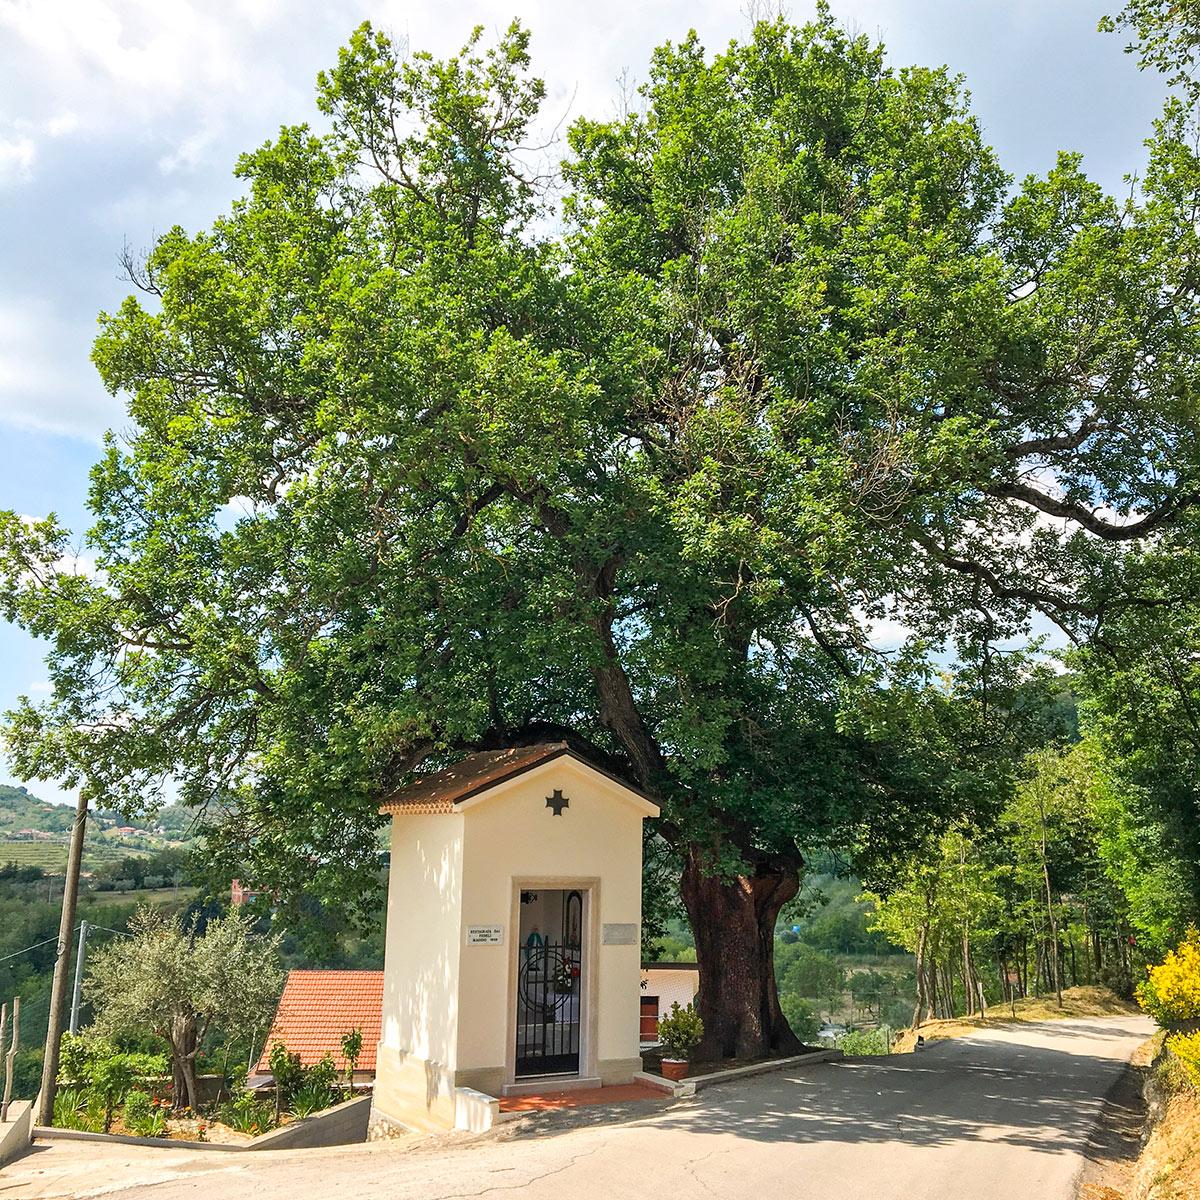 cappellina e quercia secolare valleluogo Ariano Irpino